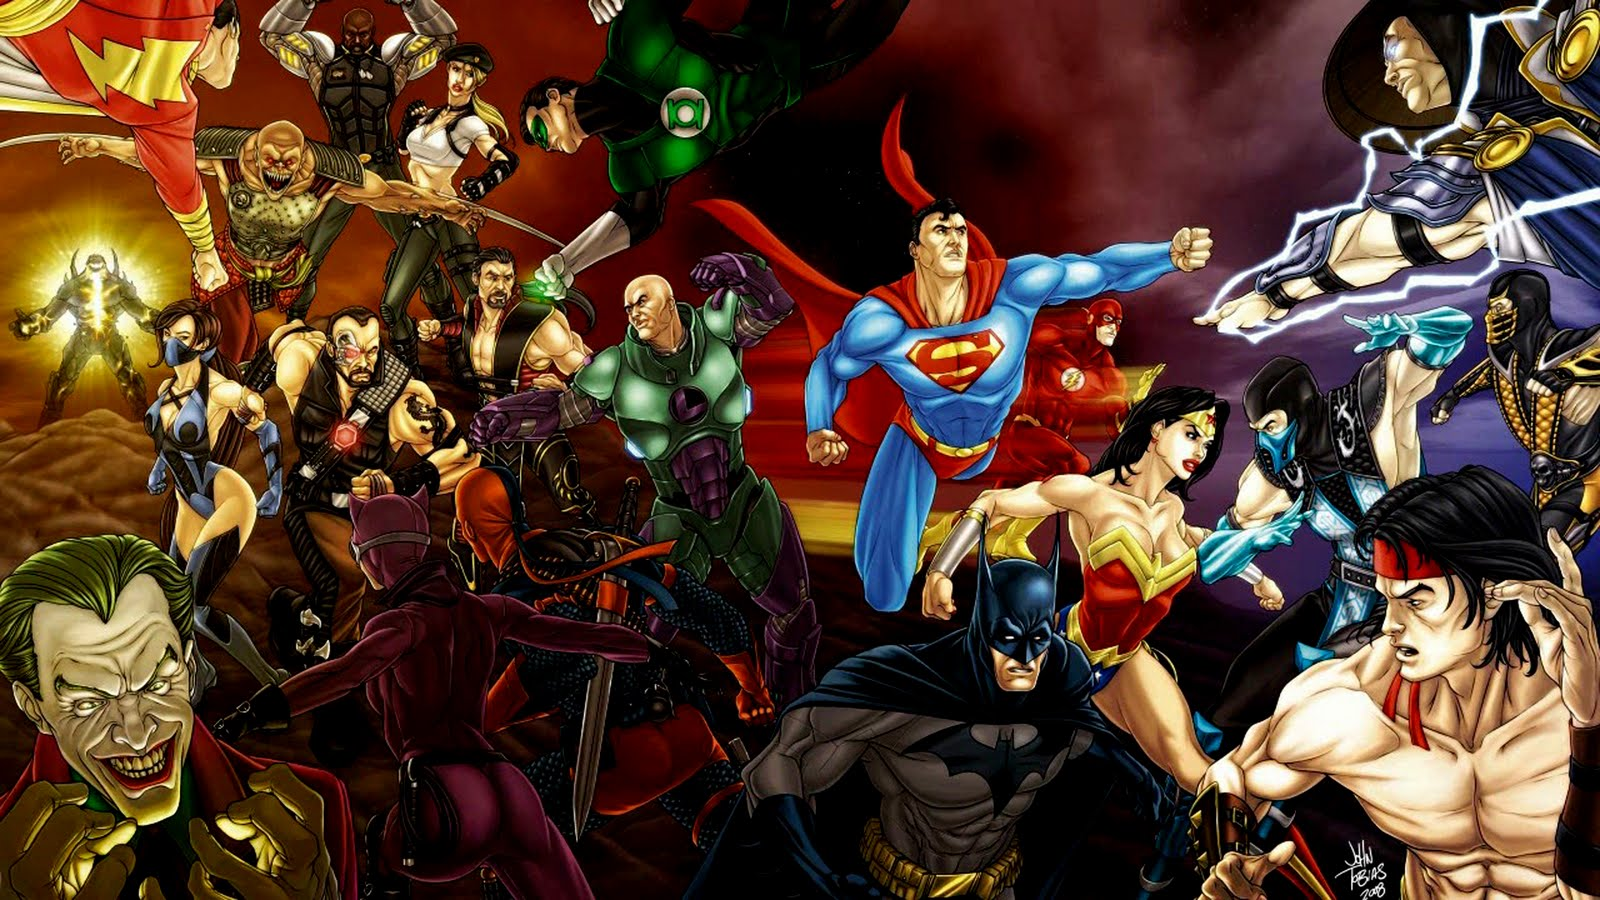 Free Dc Comics Wallpaper Mortal Kombat Vs Dc Universe